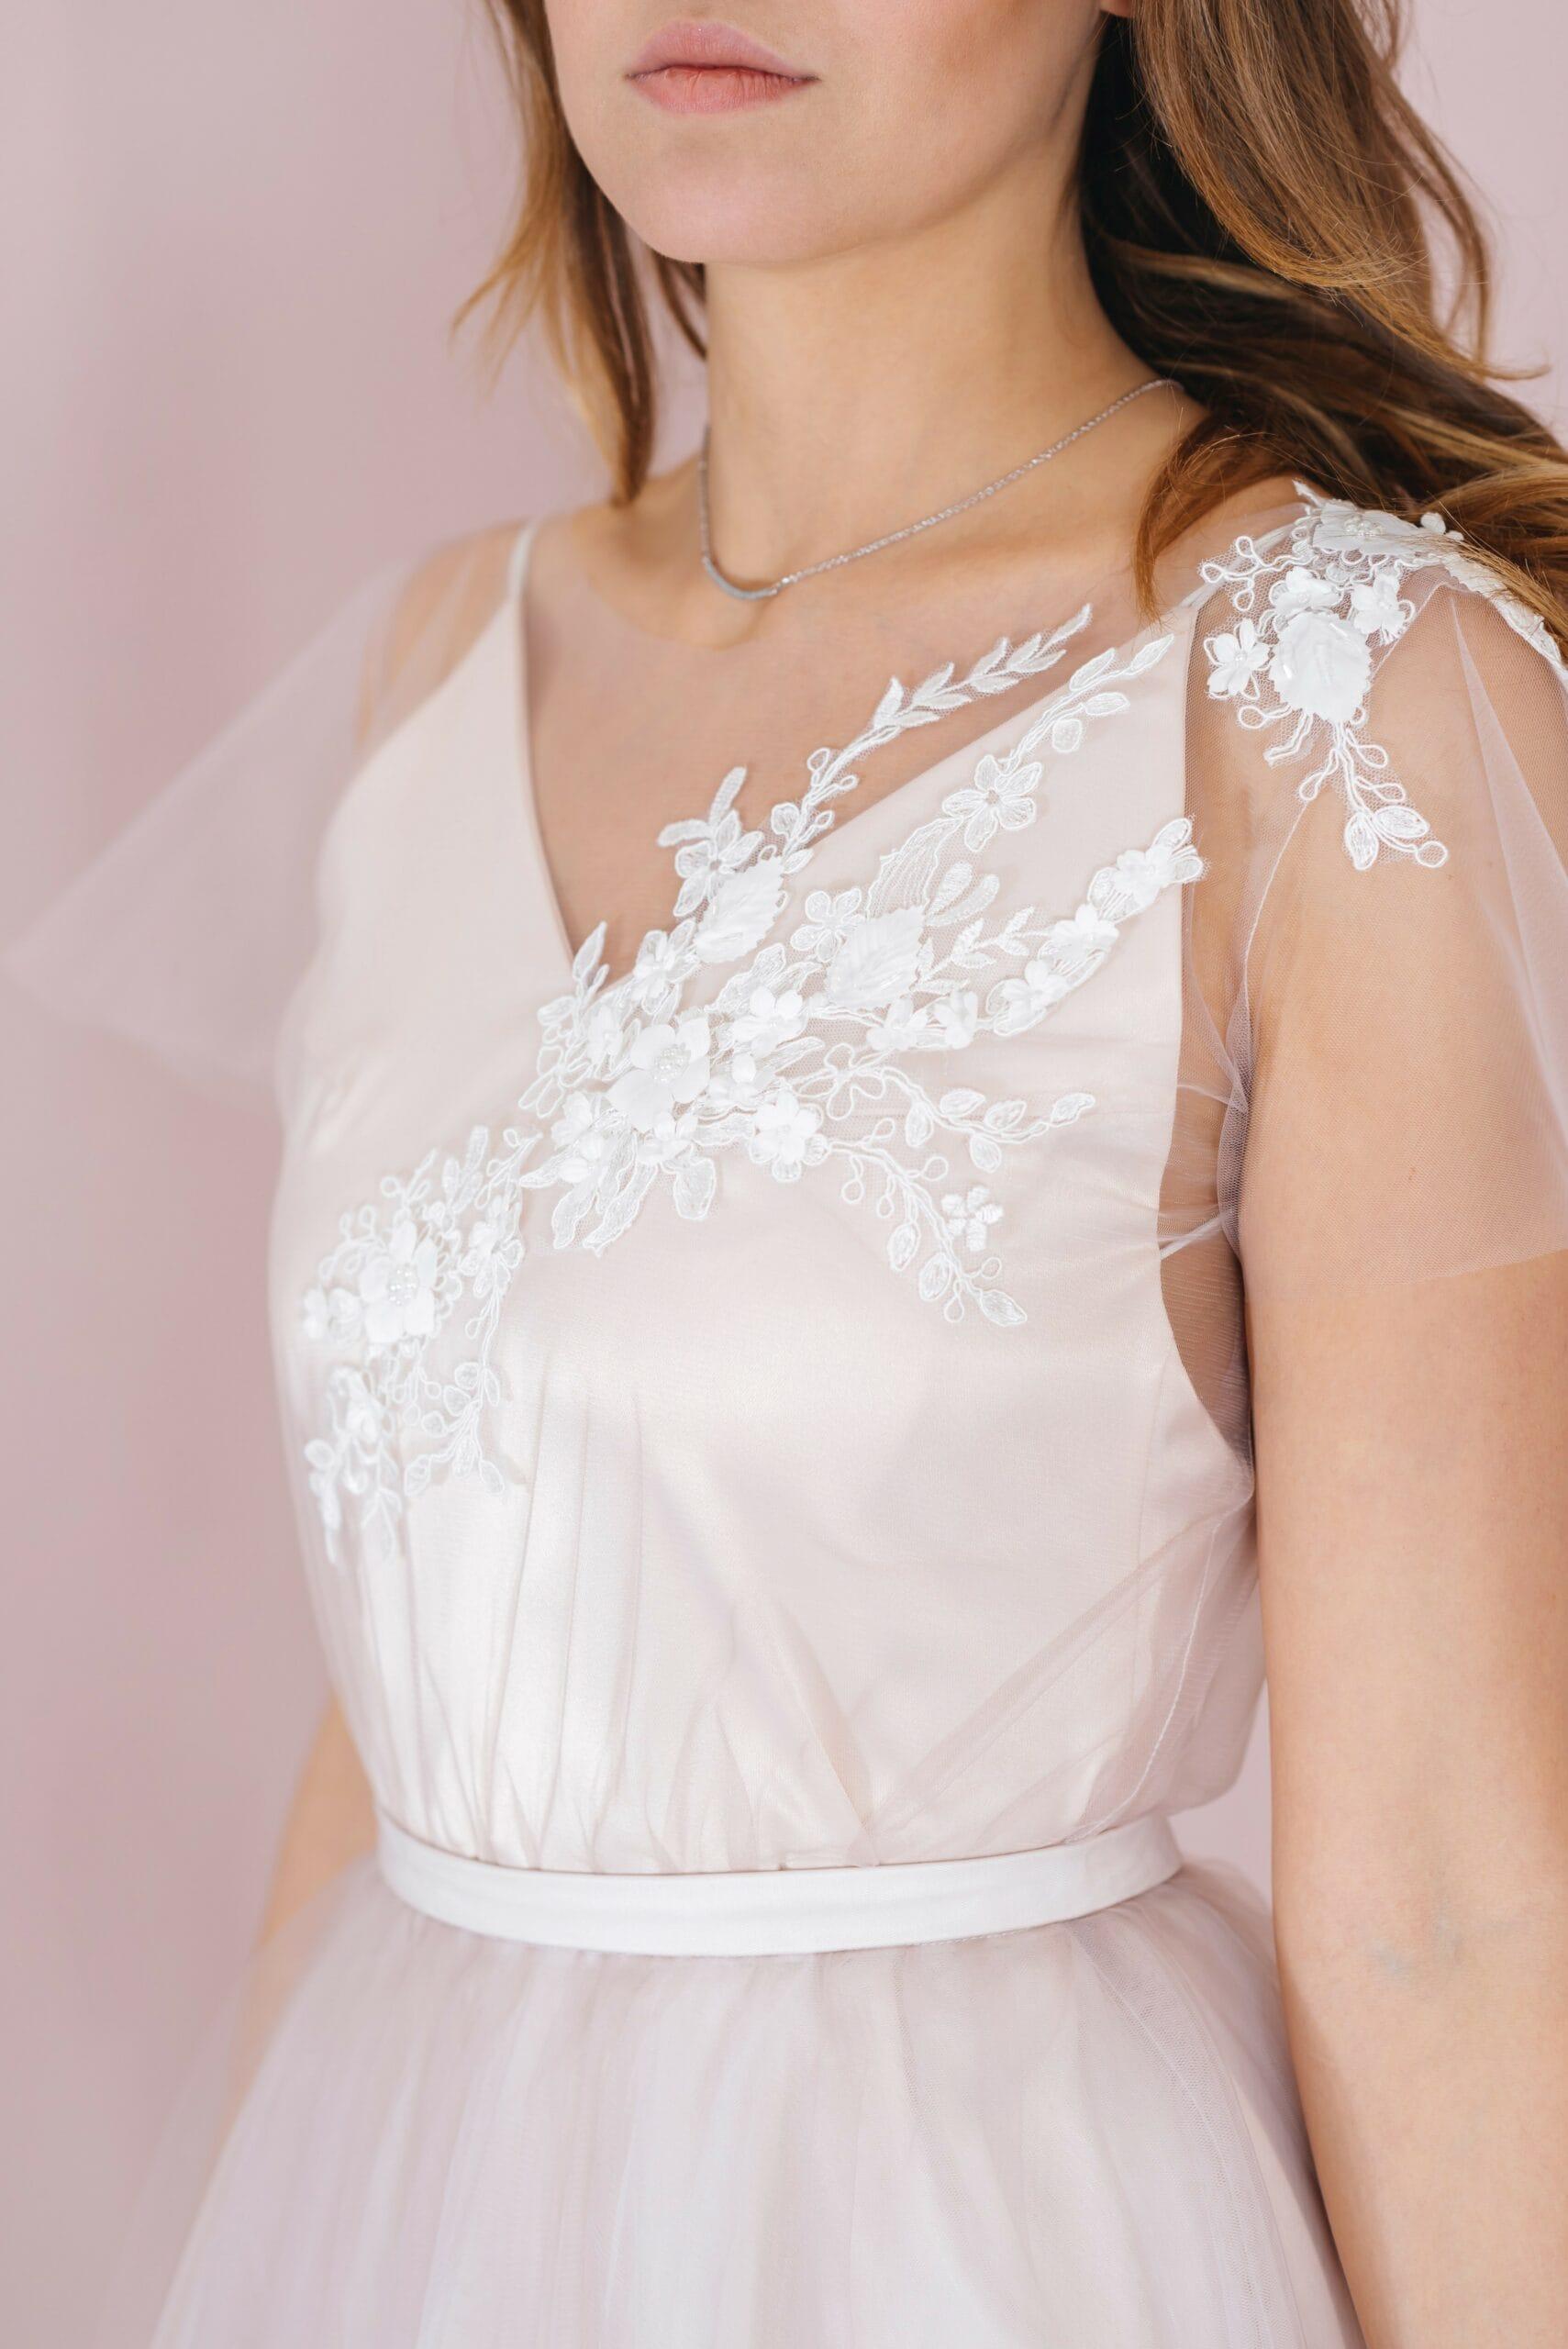 Свадебное платье LOTTI, коллекция LOFT, бренд RARE BRIDAL, фото 3